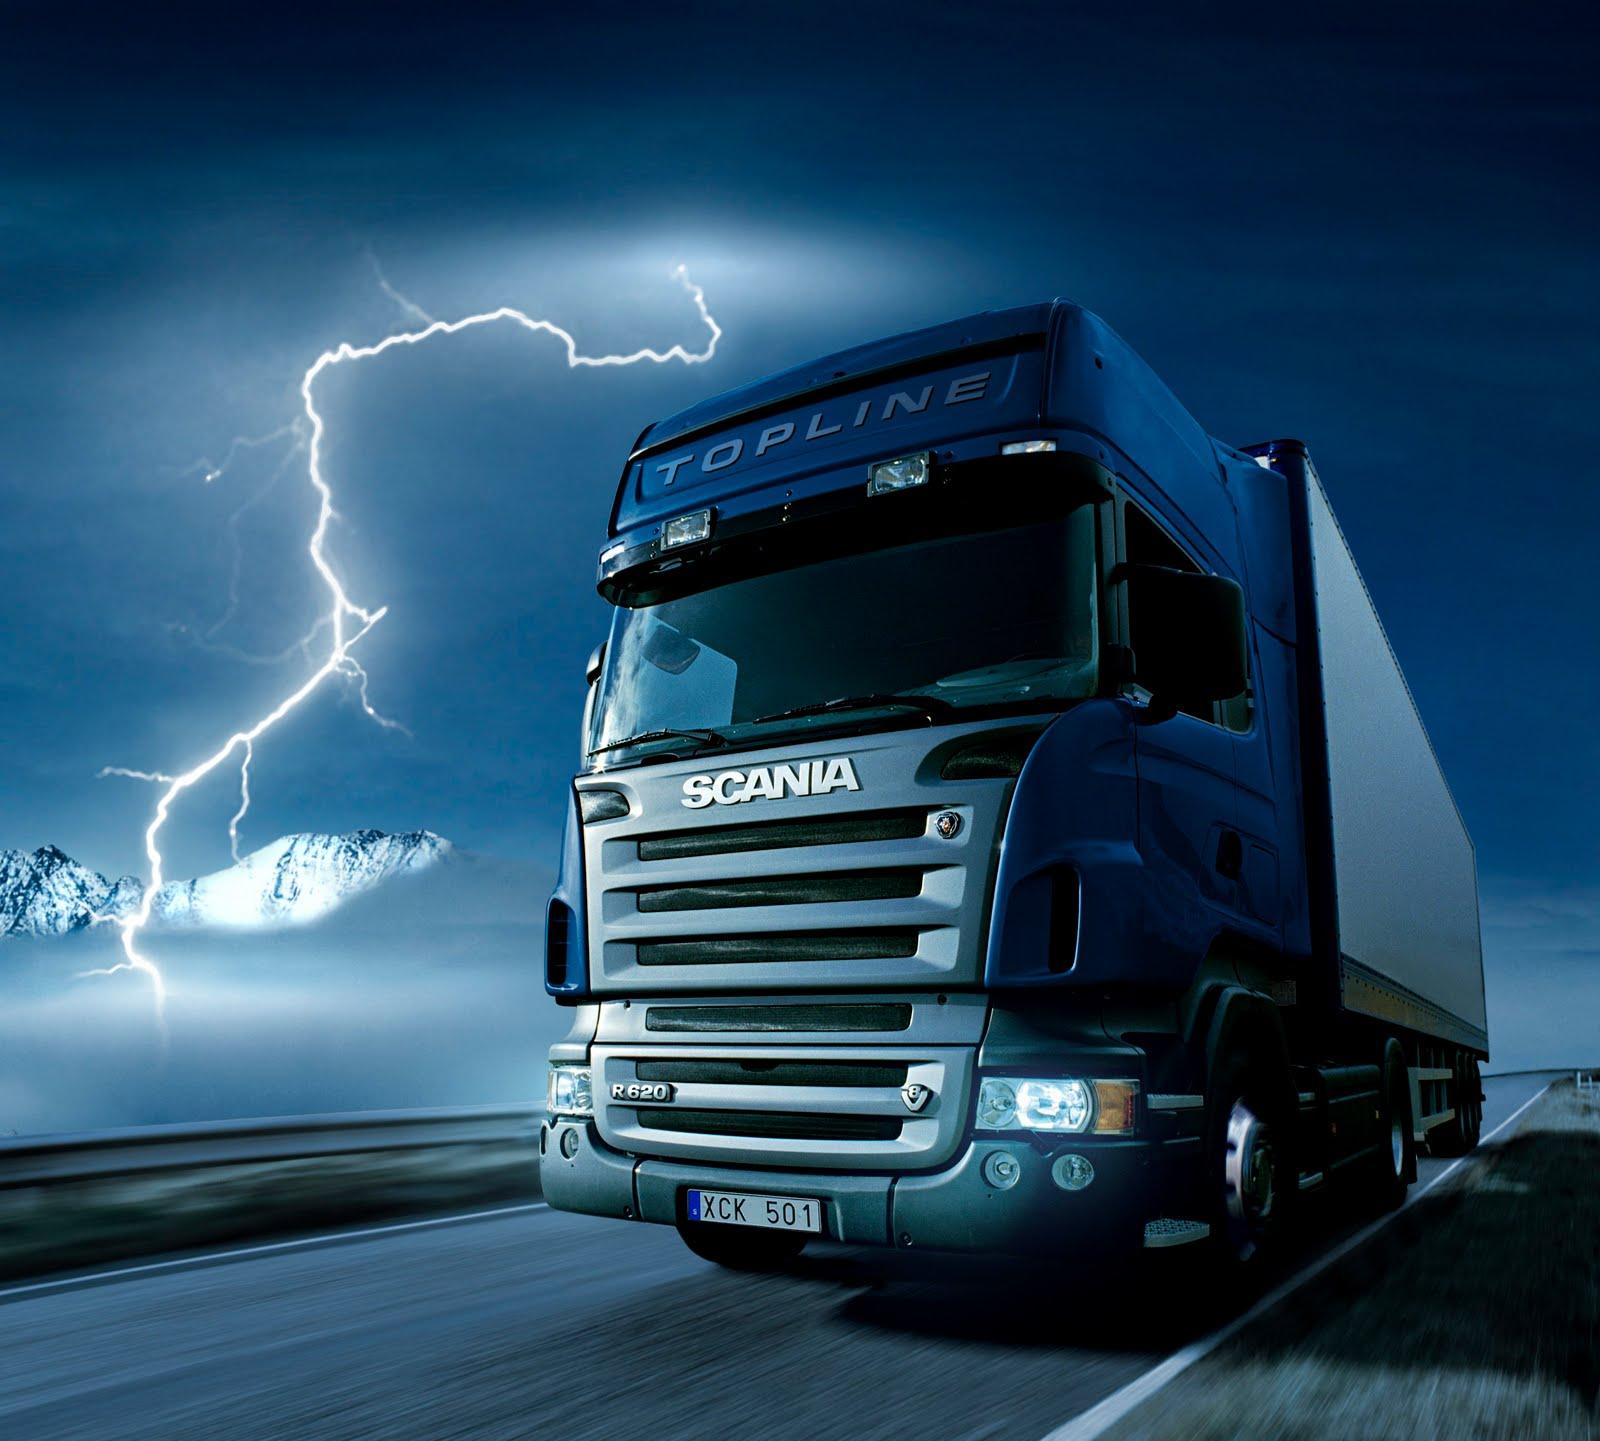 http://3.bp.blogspot.com/_iuZoryMe5qE/TGbXdeV55vI/AAAAAAAAAAo/aBSc9V5ksrA/s1600/amo_caminhoes_wallpaper_truck-54.jpg